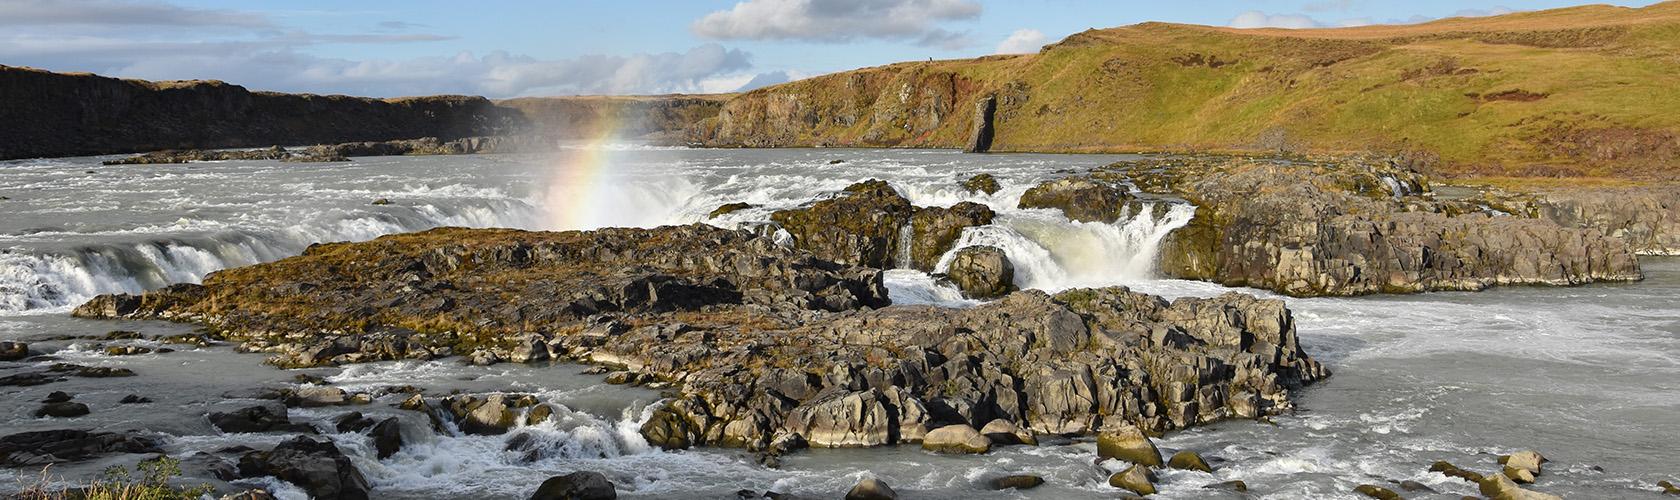 IJsland is weer open na corona lock-down